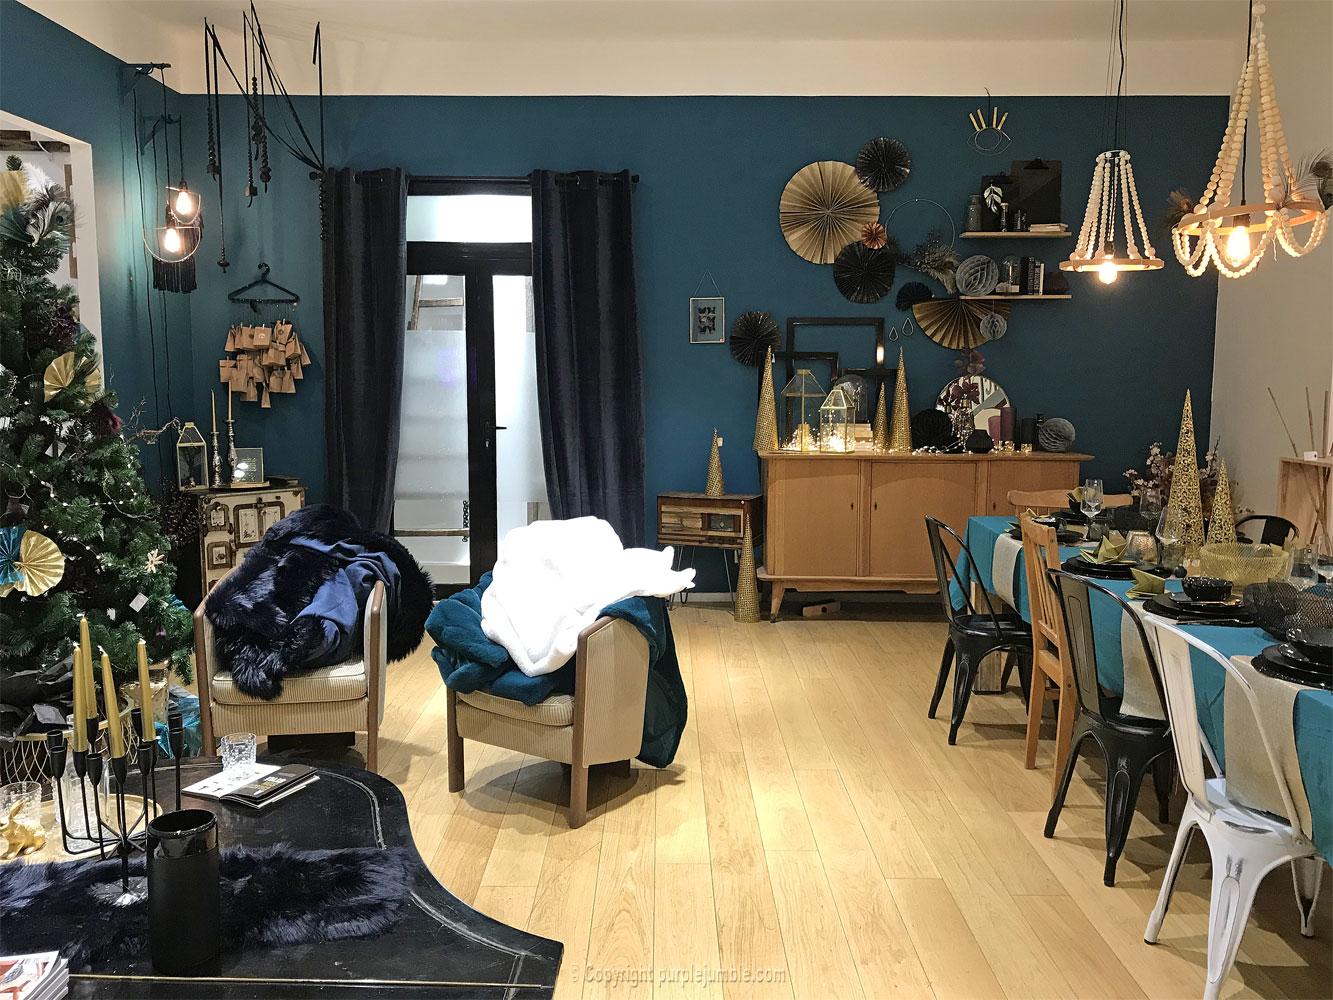 zodio-noel-2018-deco-maison-20